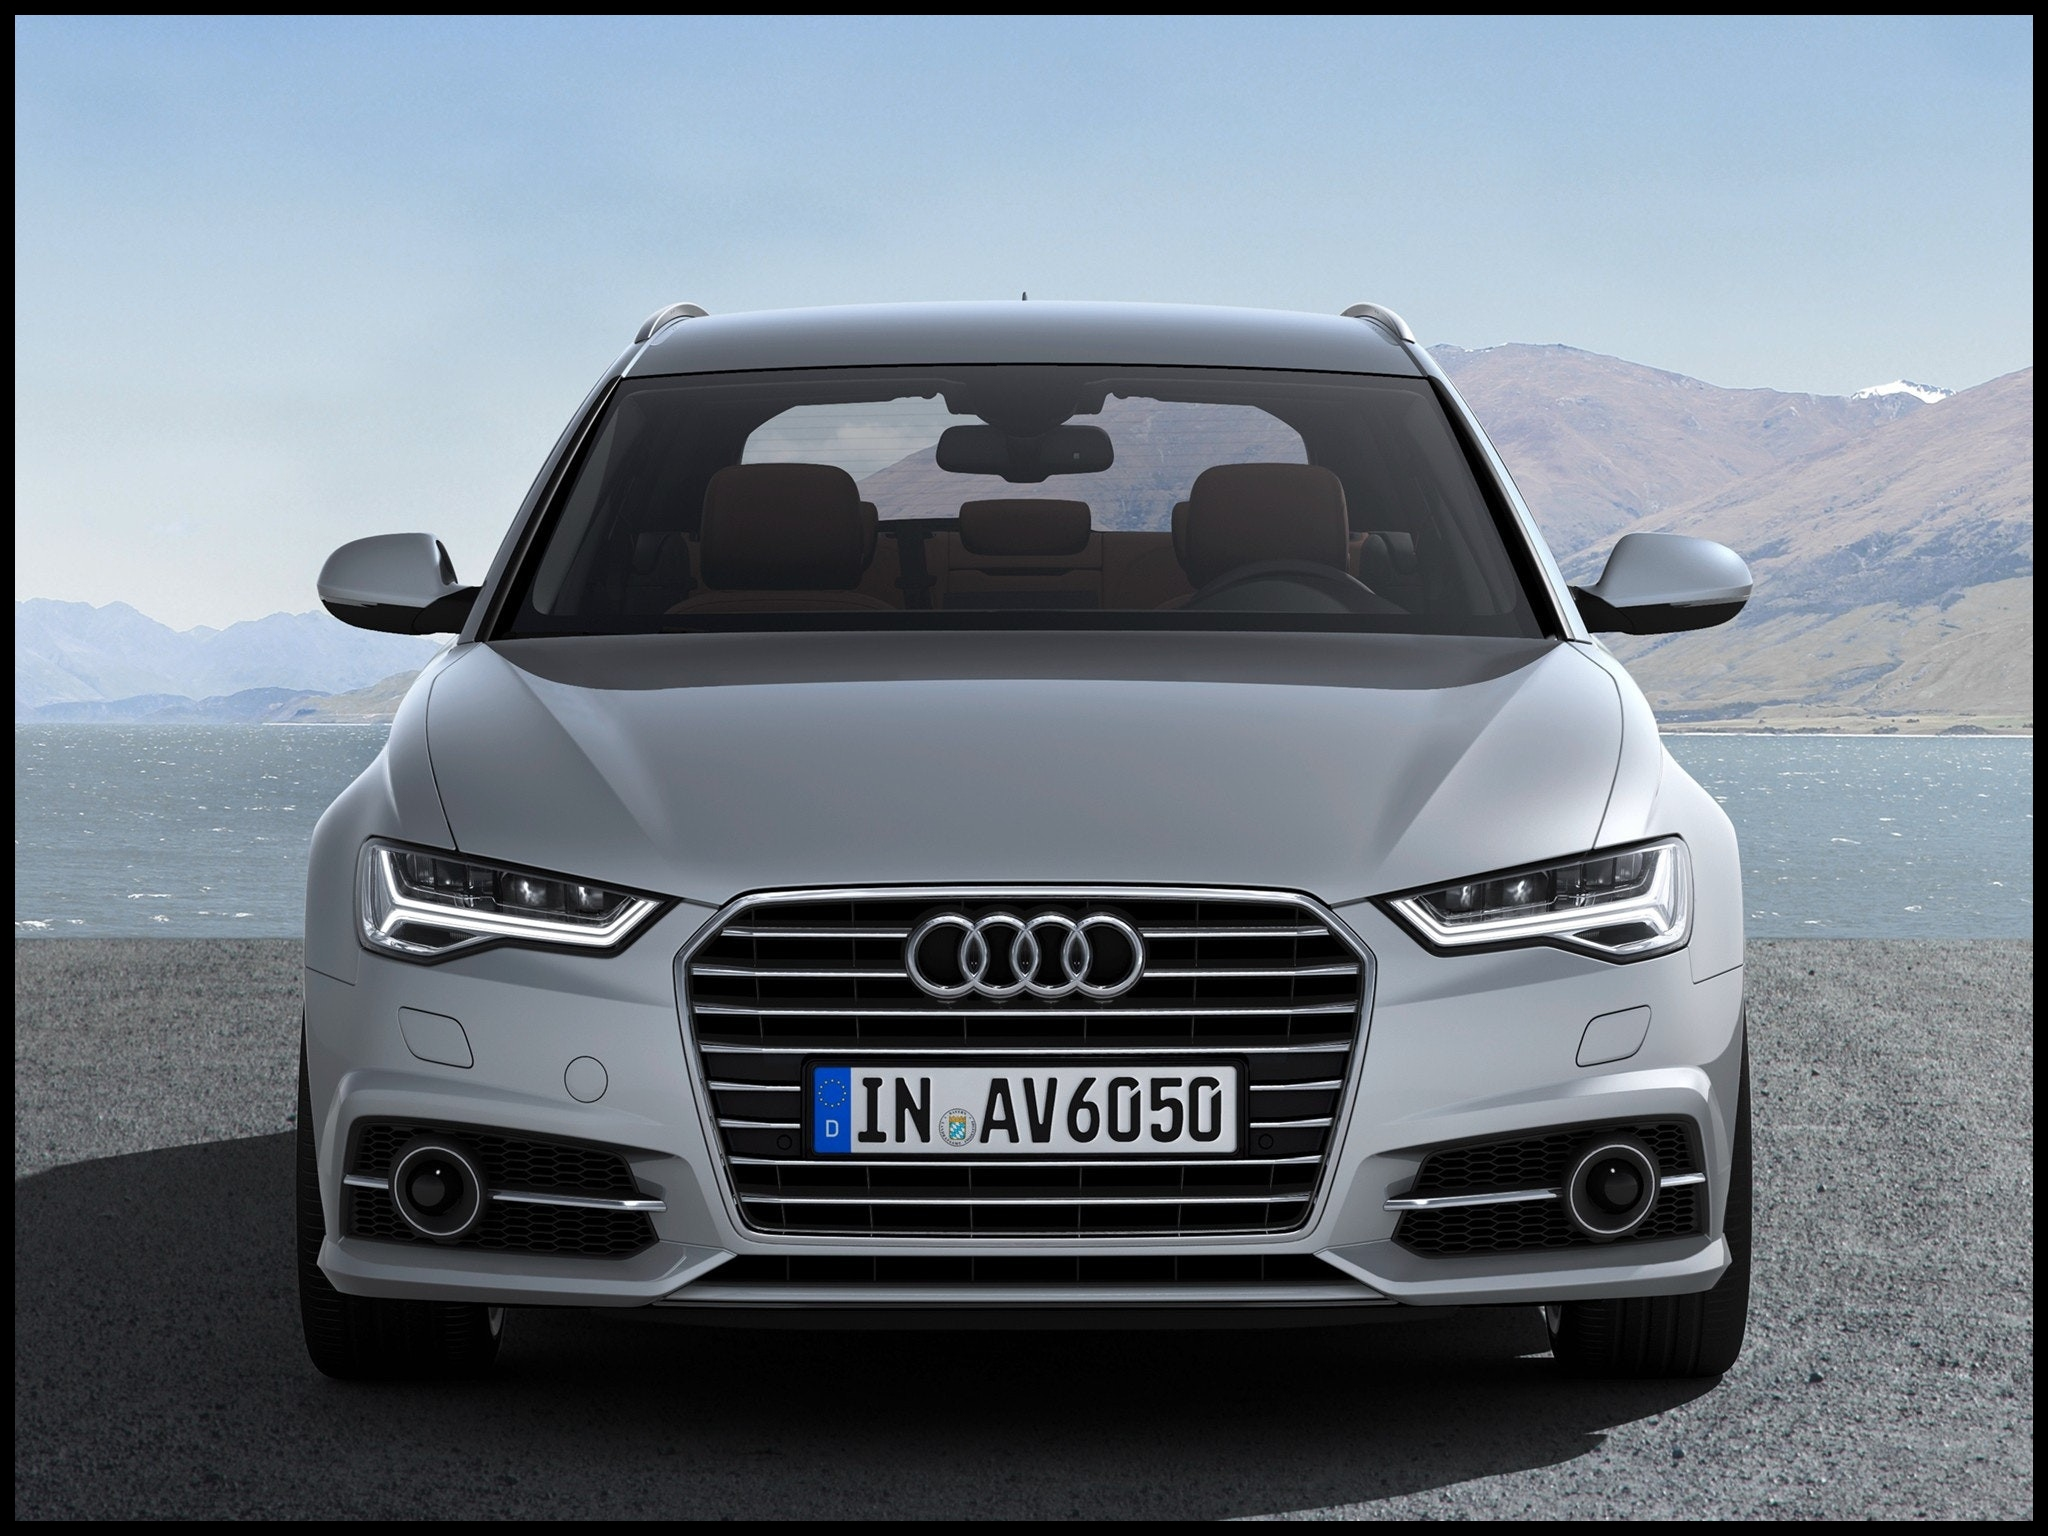 Used Cars Mentor Ohio Beautiful Audi Mentor New Audi A6 Avant 2017 1600 0d Auto 2018